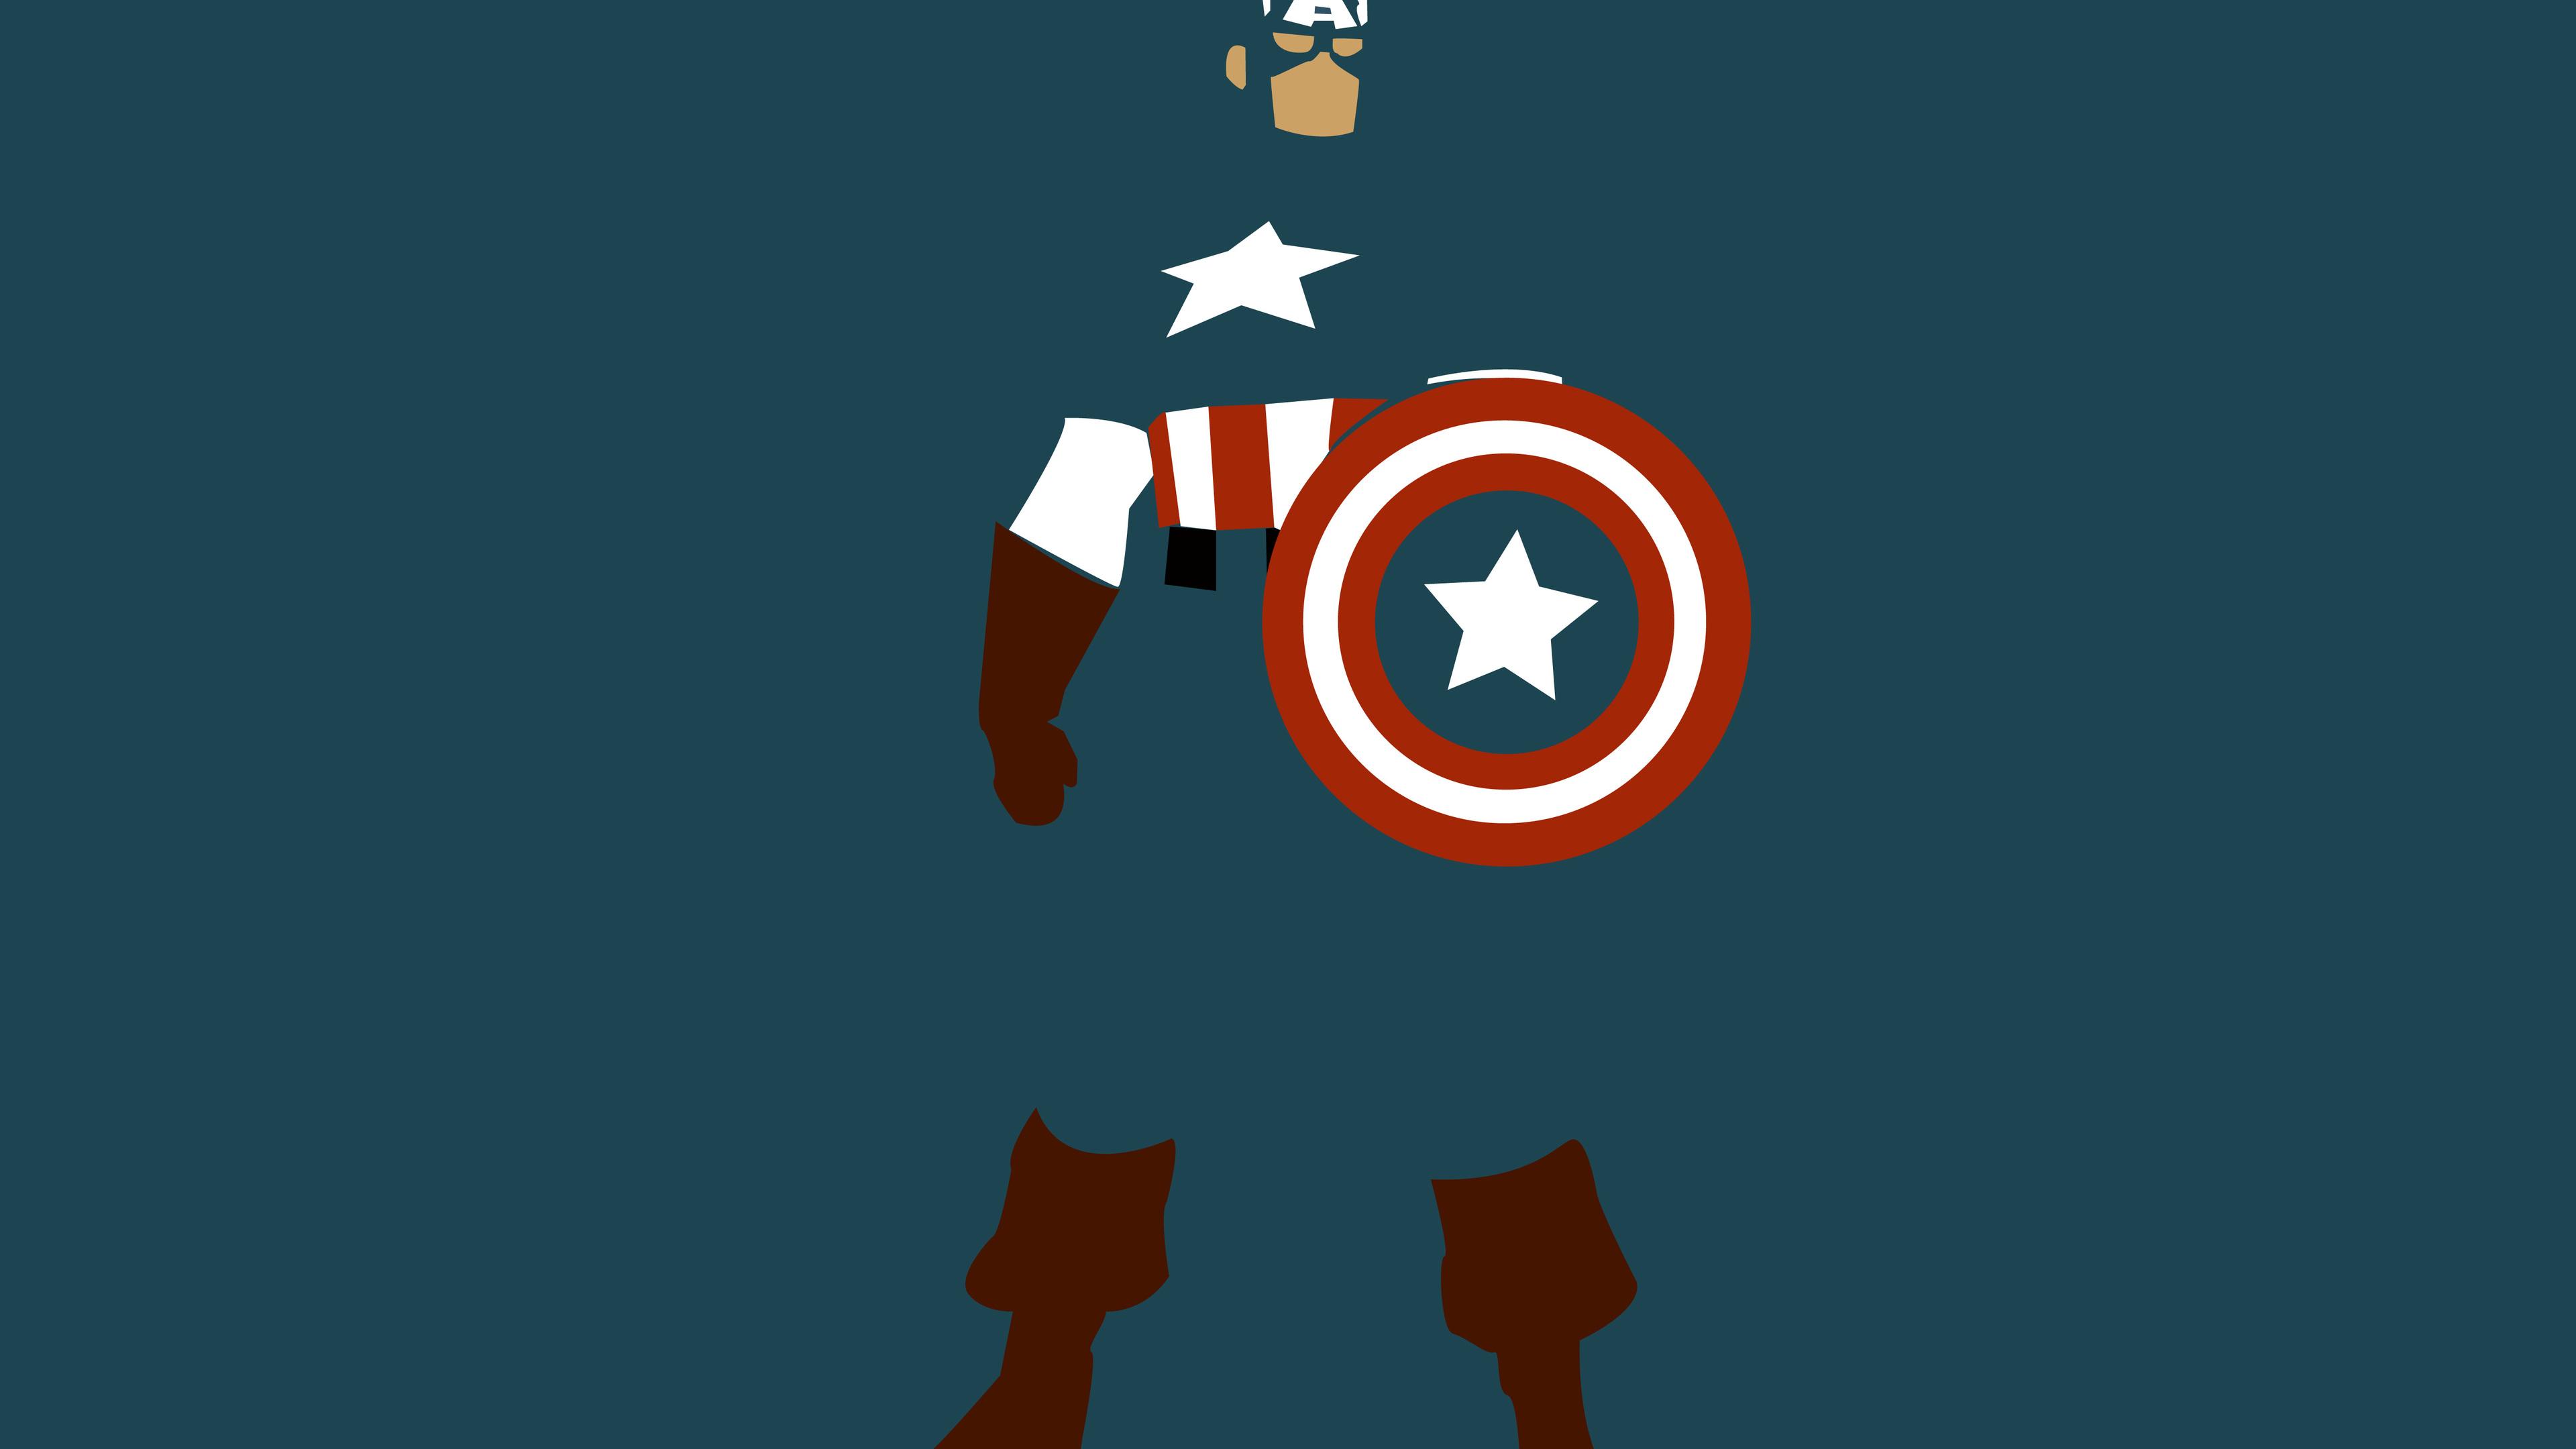 captain america minimalism 1536521947 - Captain America Minimalism - superheroes wallpapers, minimalism wallpapers, marvel wallpapers, hd-wallpapers, digital art wallpapers, deviantart wallpapers, captain america wallpapers, artwork wallpapers, artist wallpapers, 4k-wallpapers